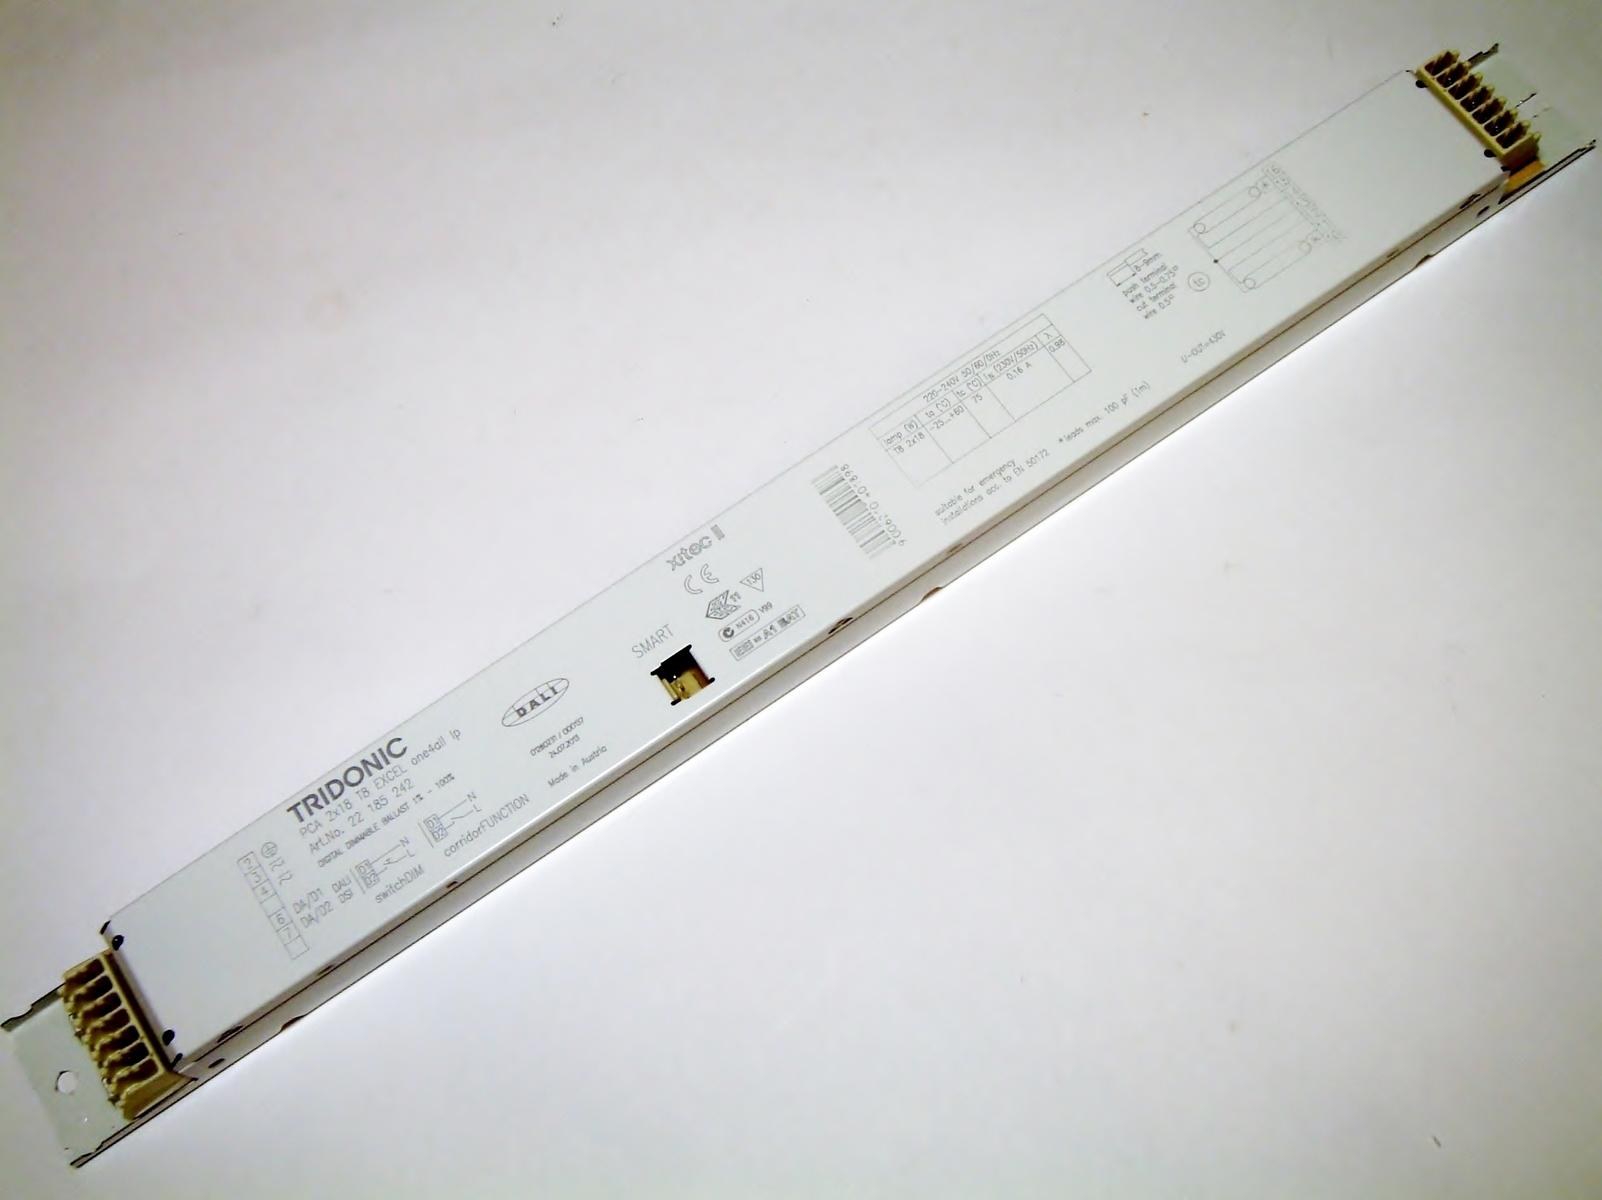 Elektrooniline drossel 2x18 W, Tridonic, PCA 2x18 T8 Excel one4all Ip, 22185242